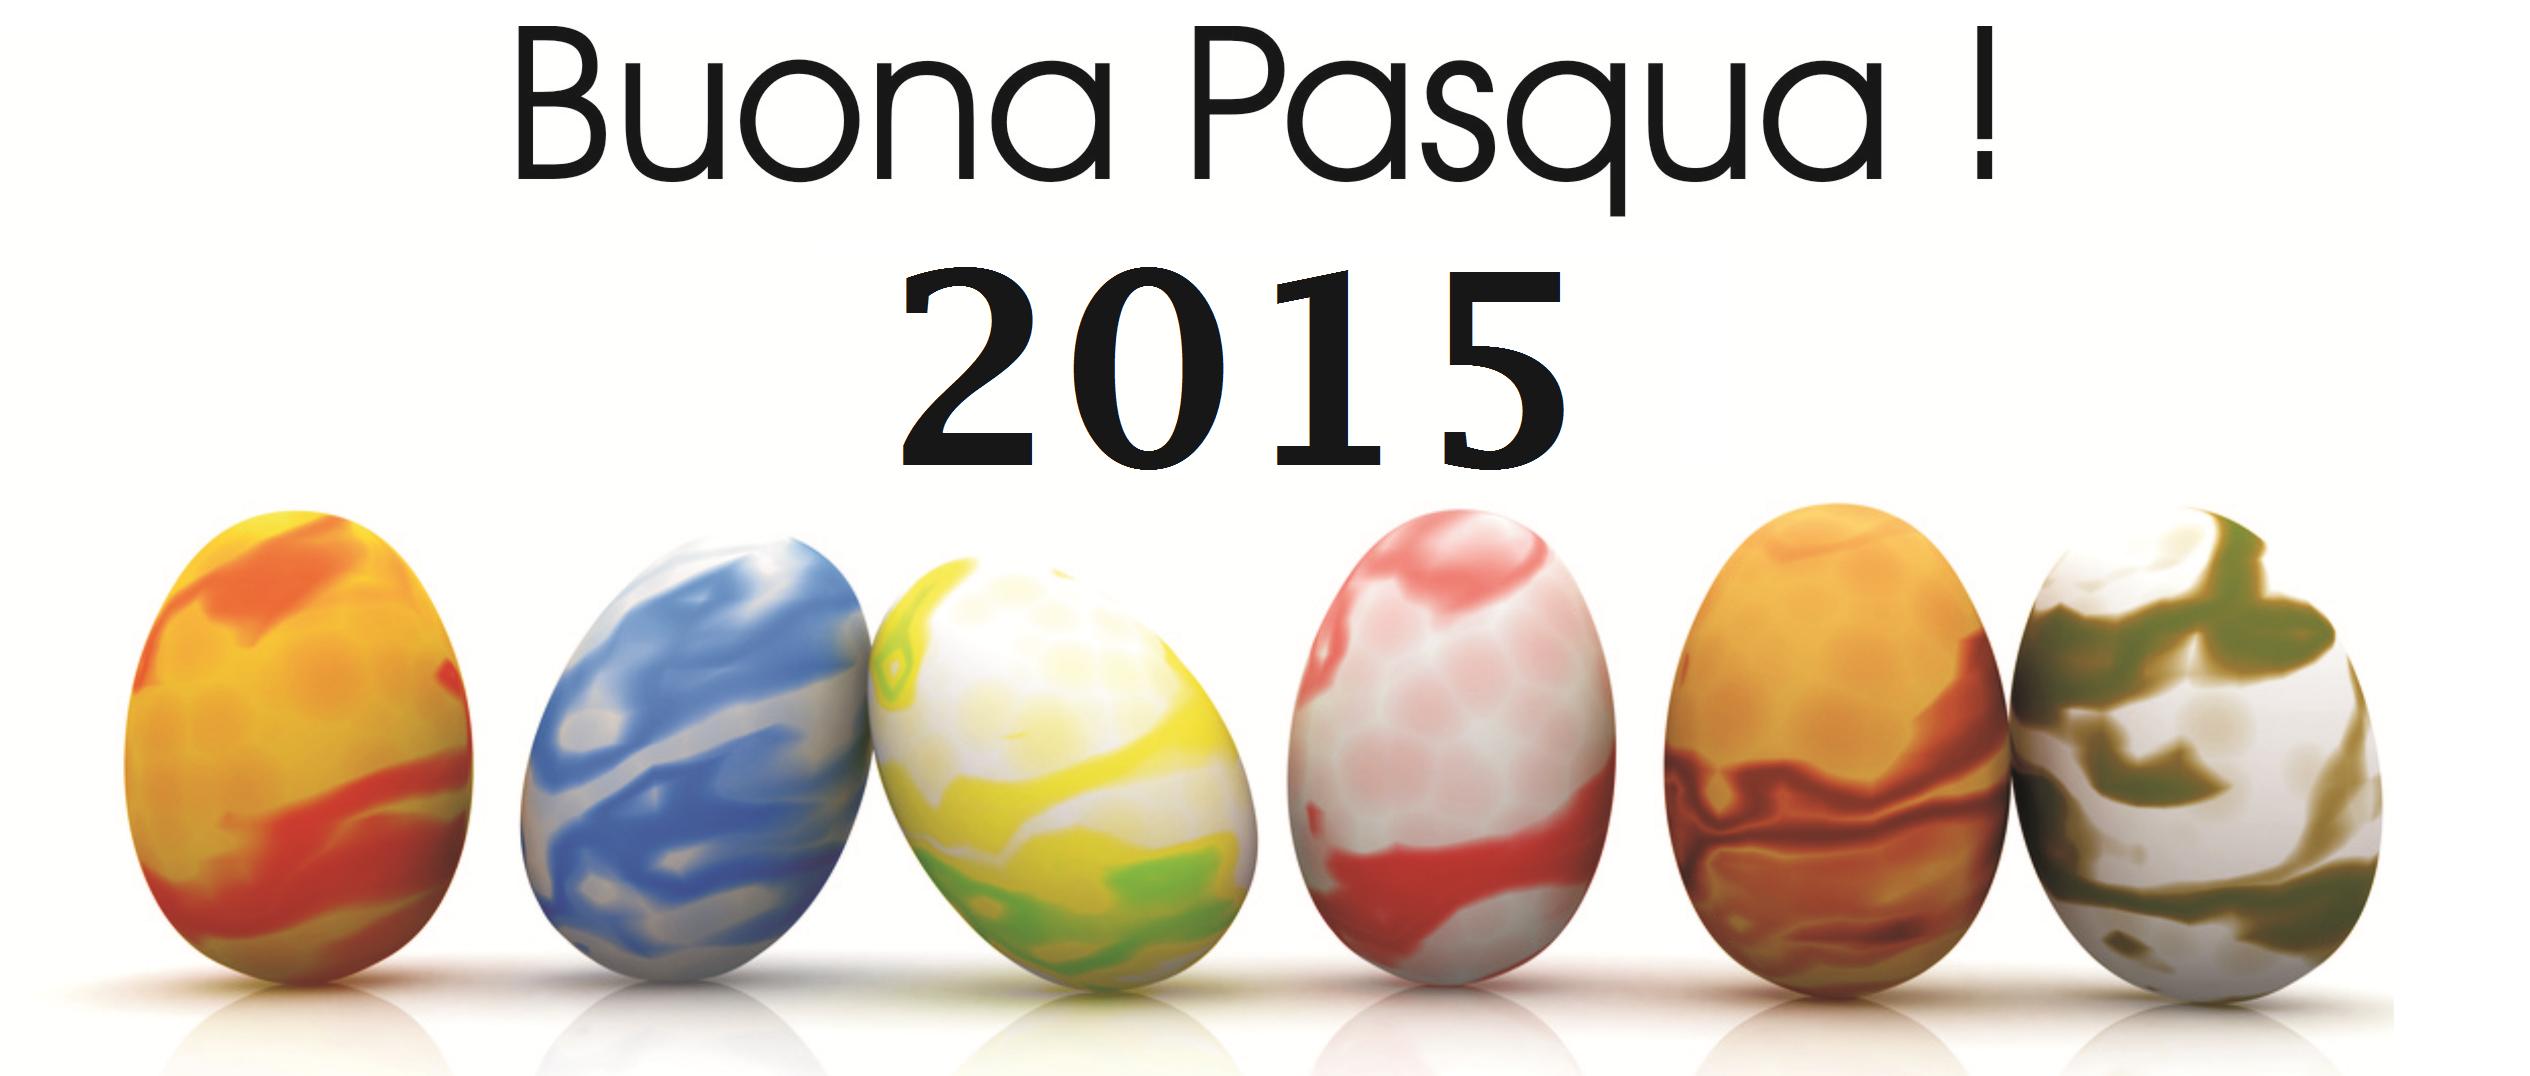 Buona-Pasqua-2015-auguri